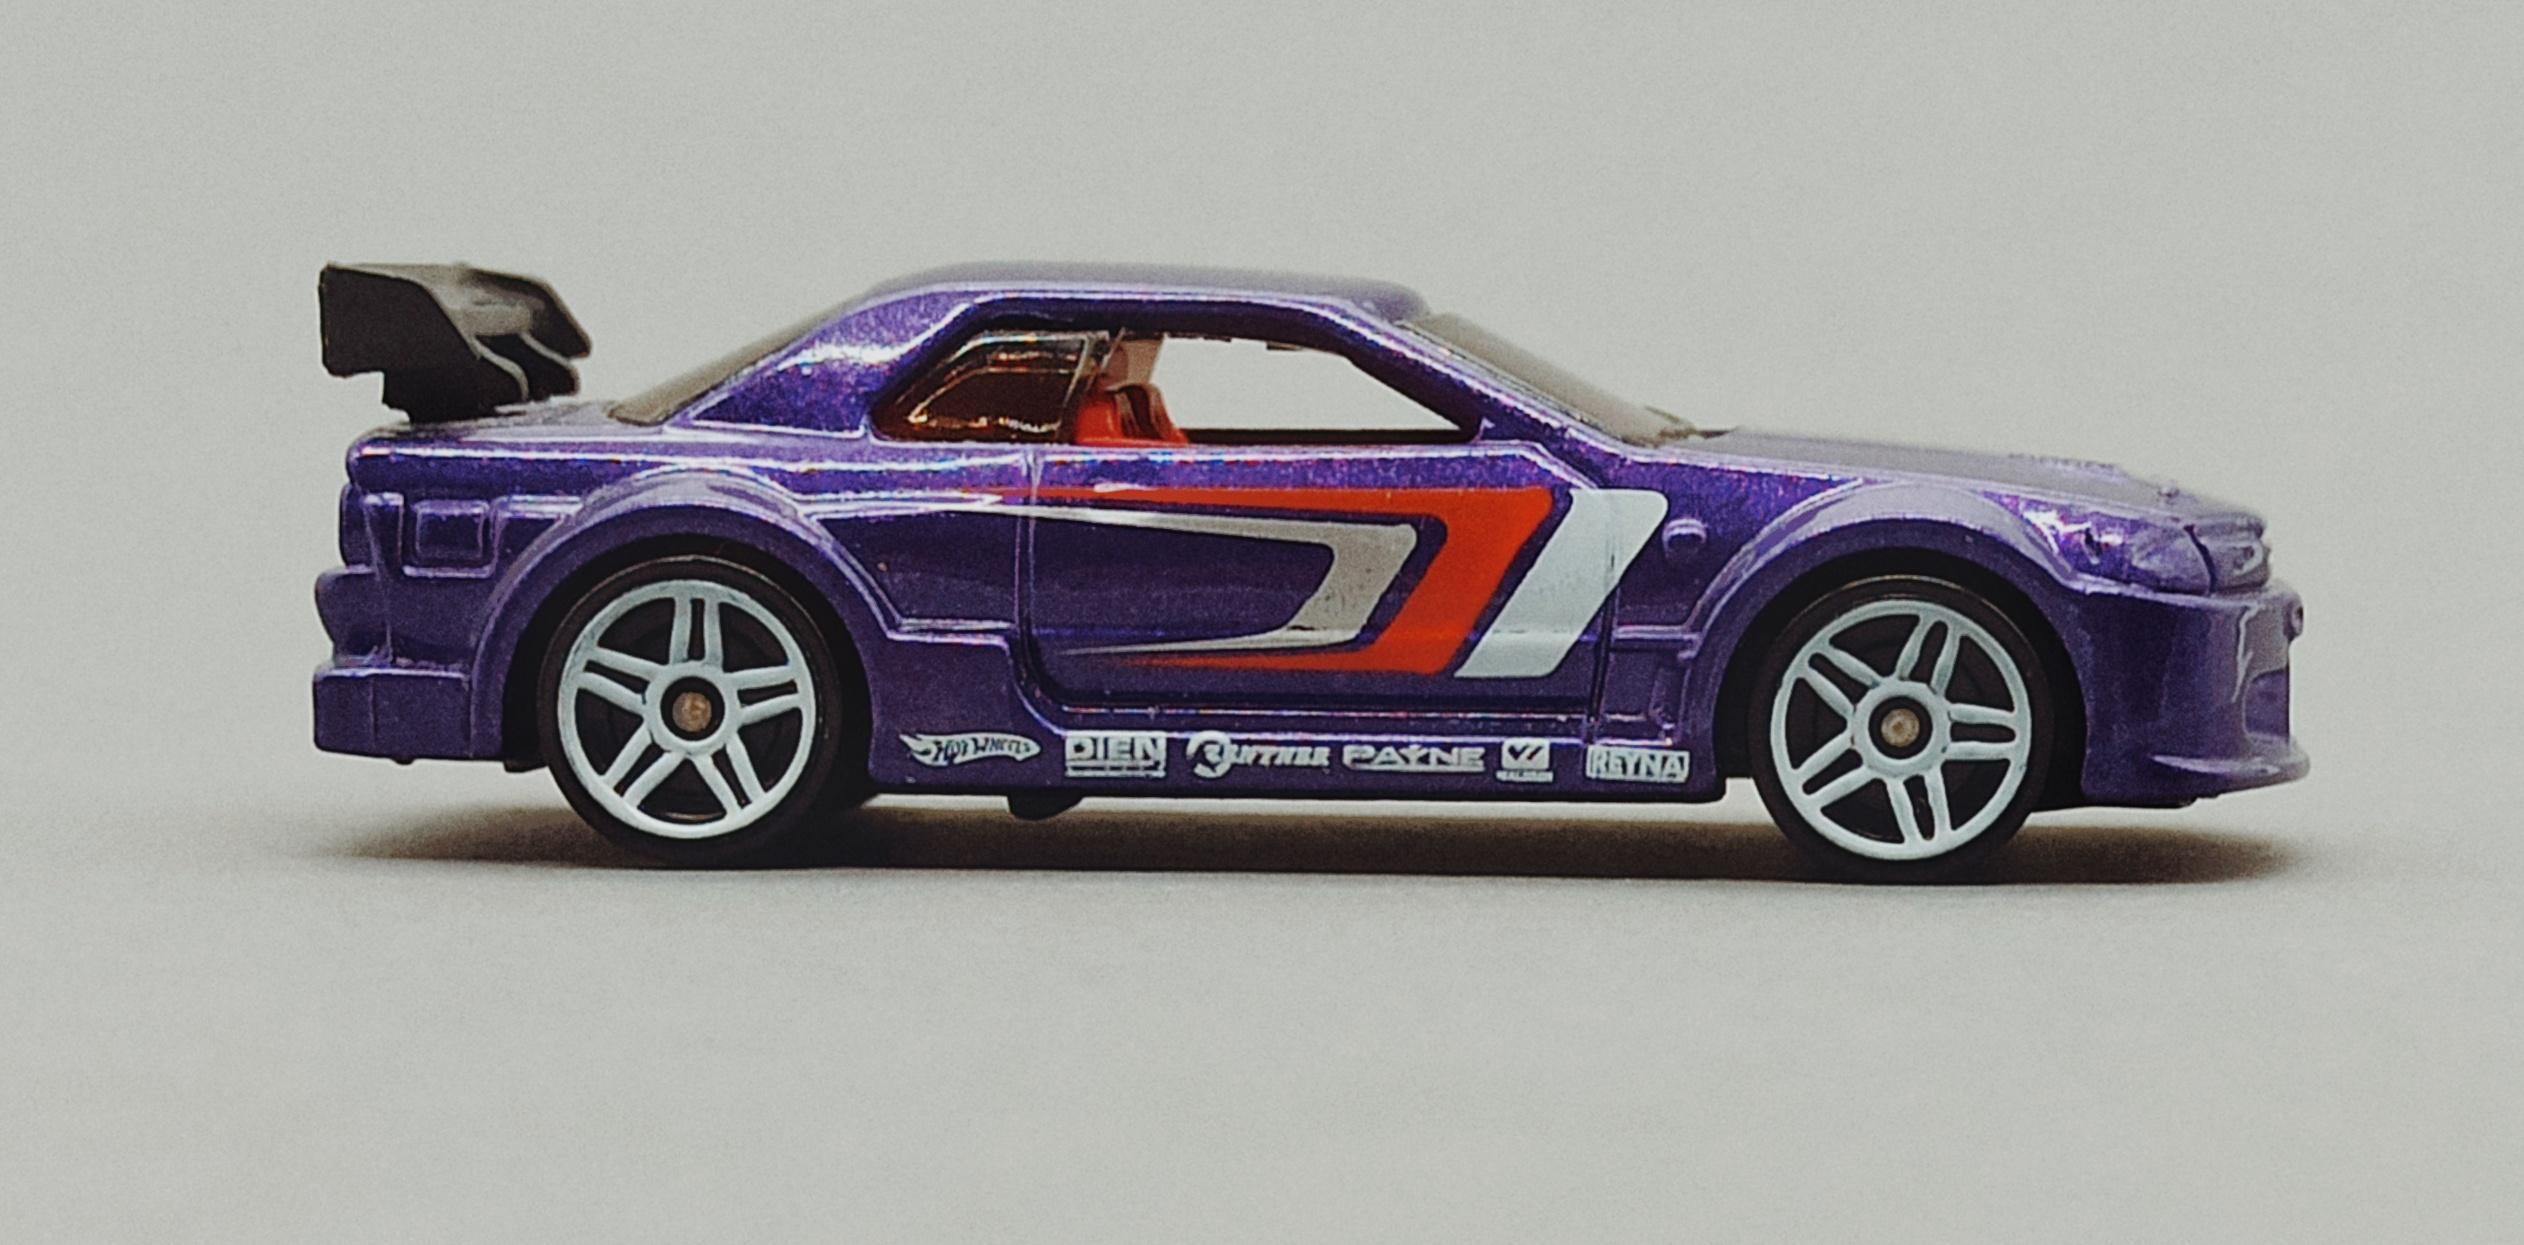 Hot Wheels Nissan Skyline (V0104) 2011 Racing Kits: Street Race (3/12) purple side